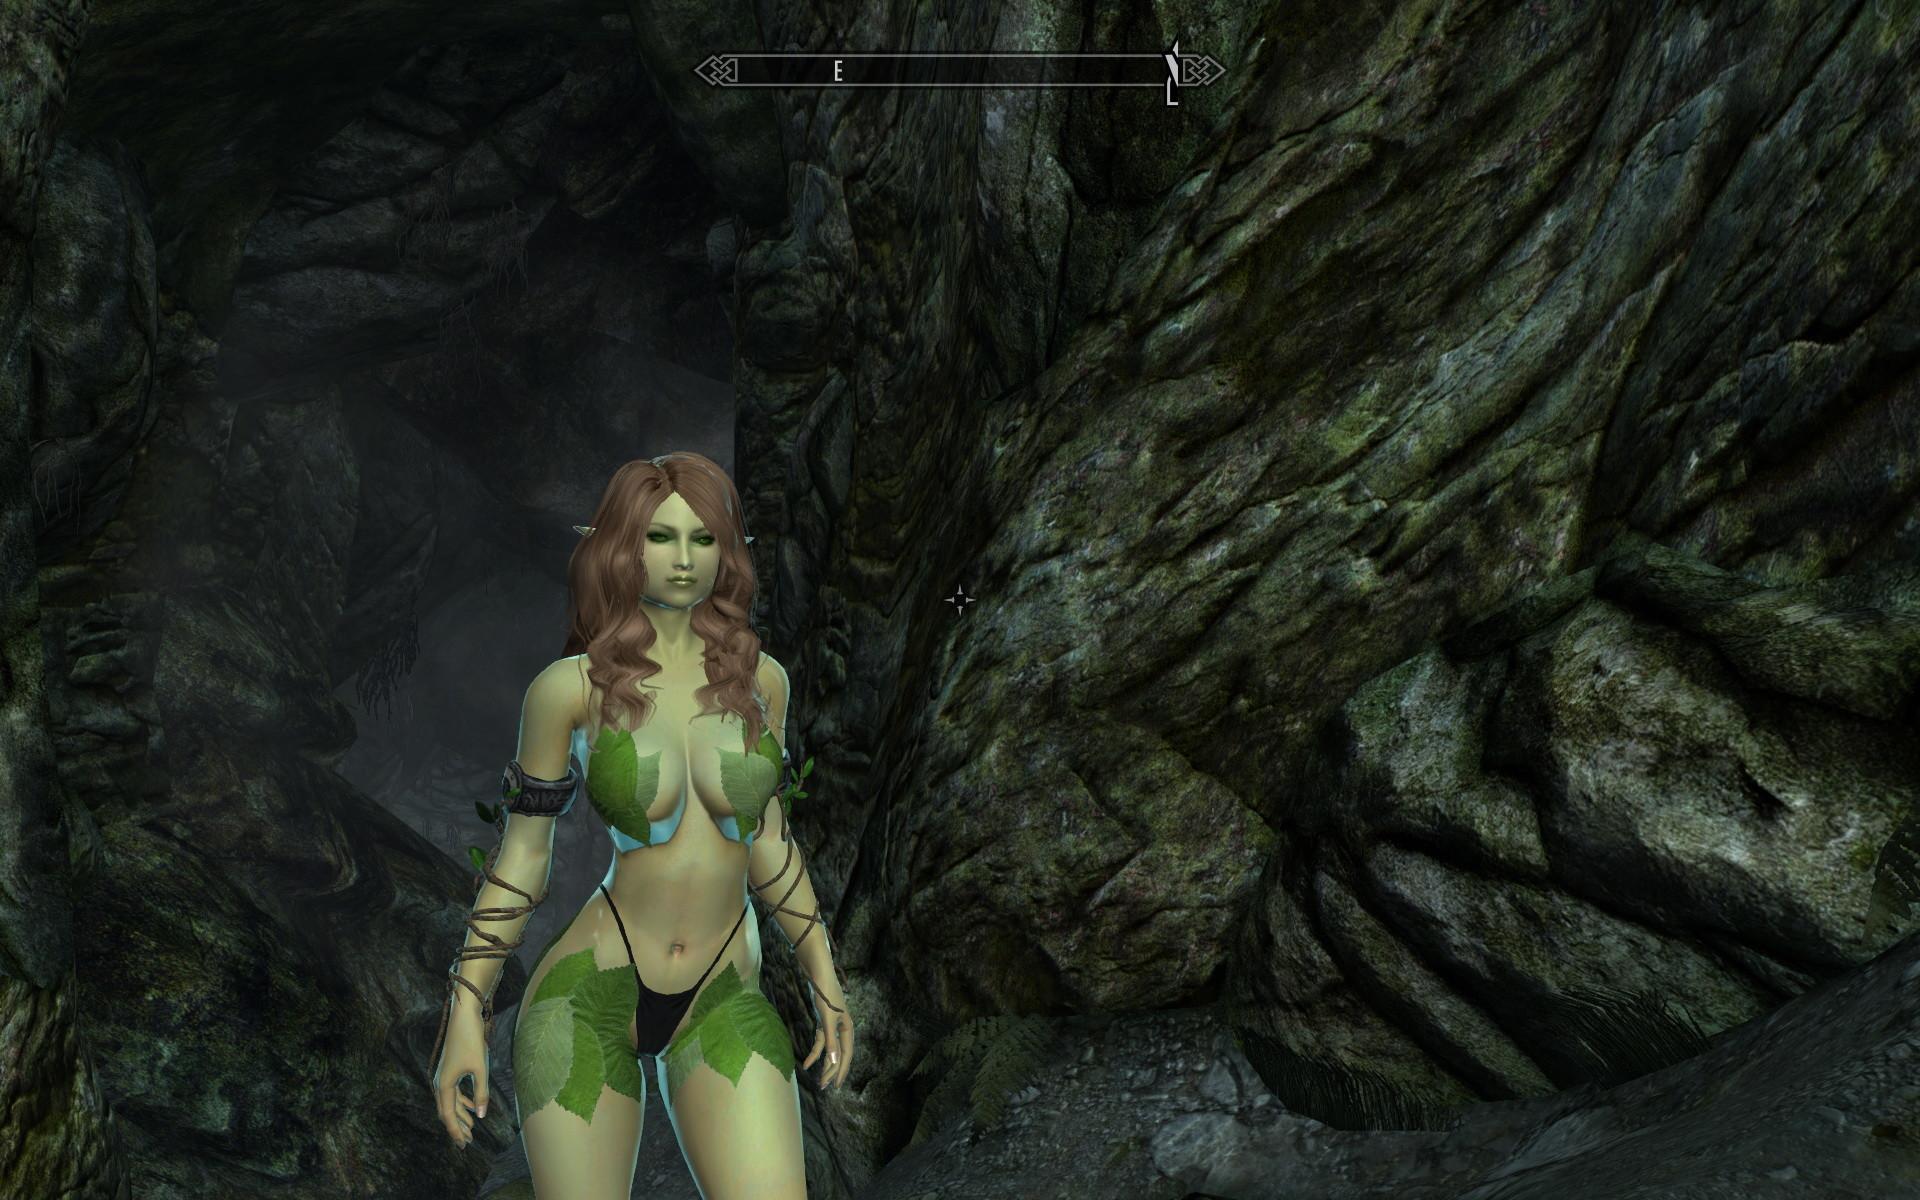 Female Skyrim Wallpaper (85+ images)